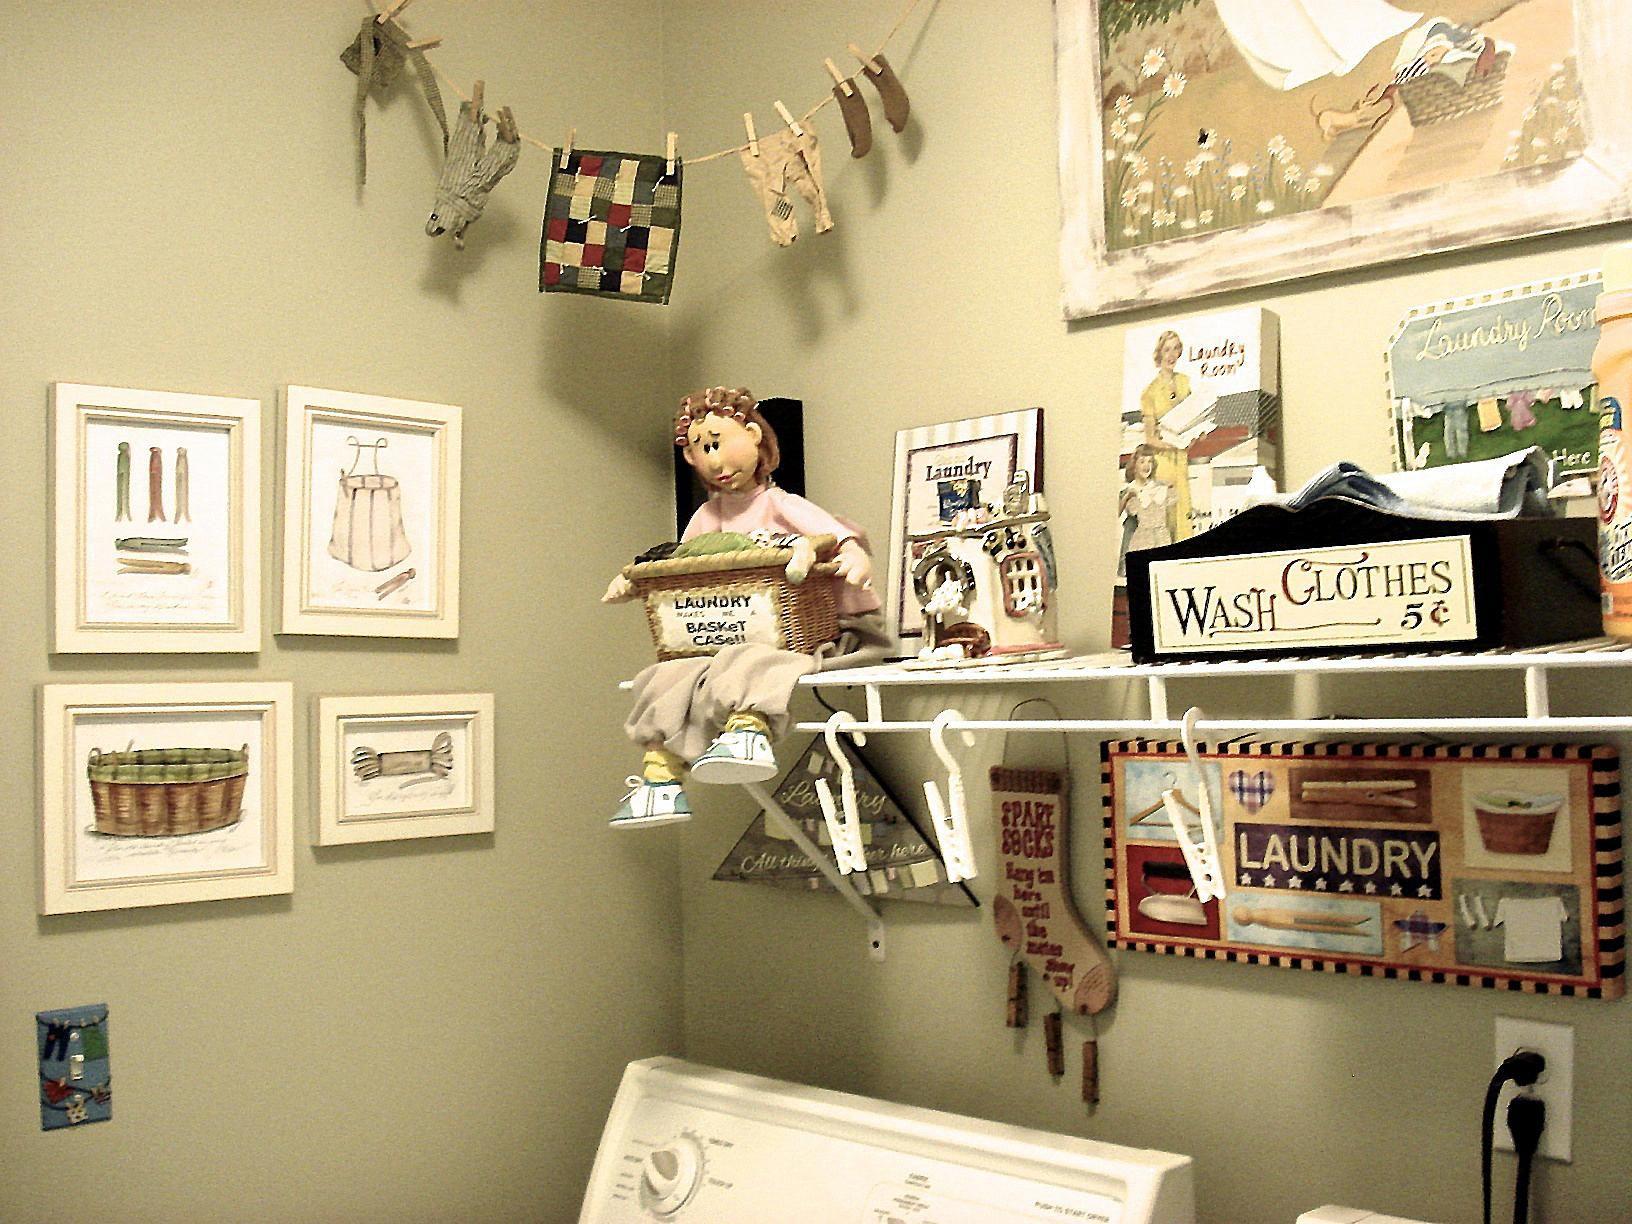 Create a Clothesline Themed Laundry Room